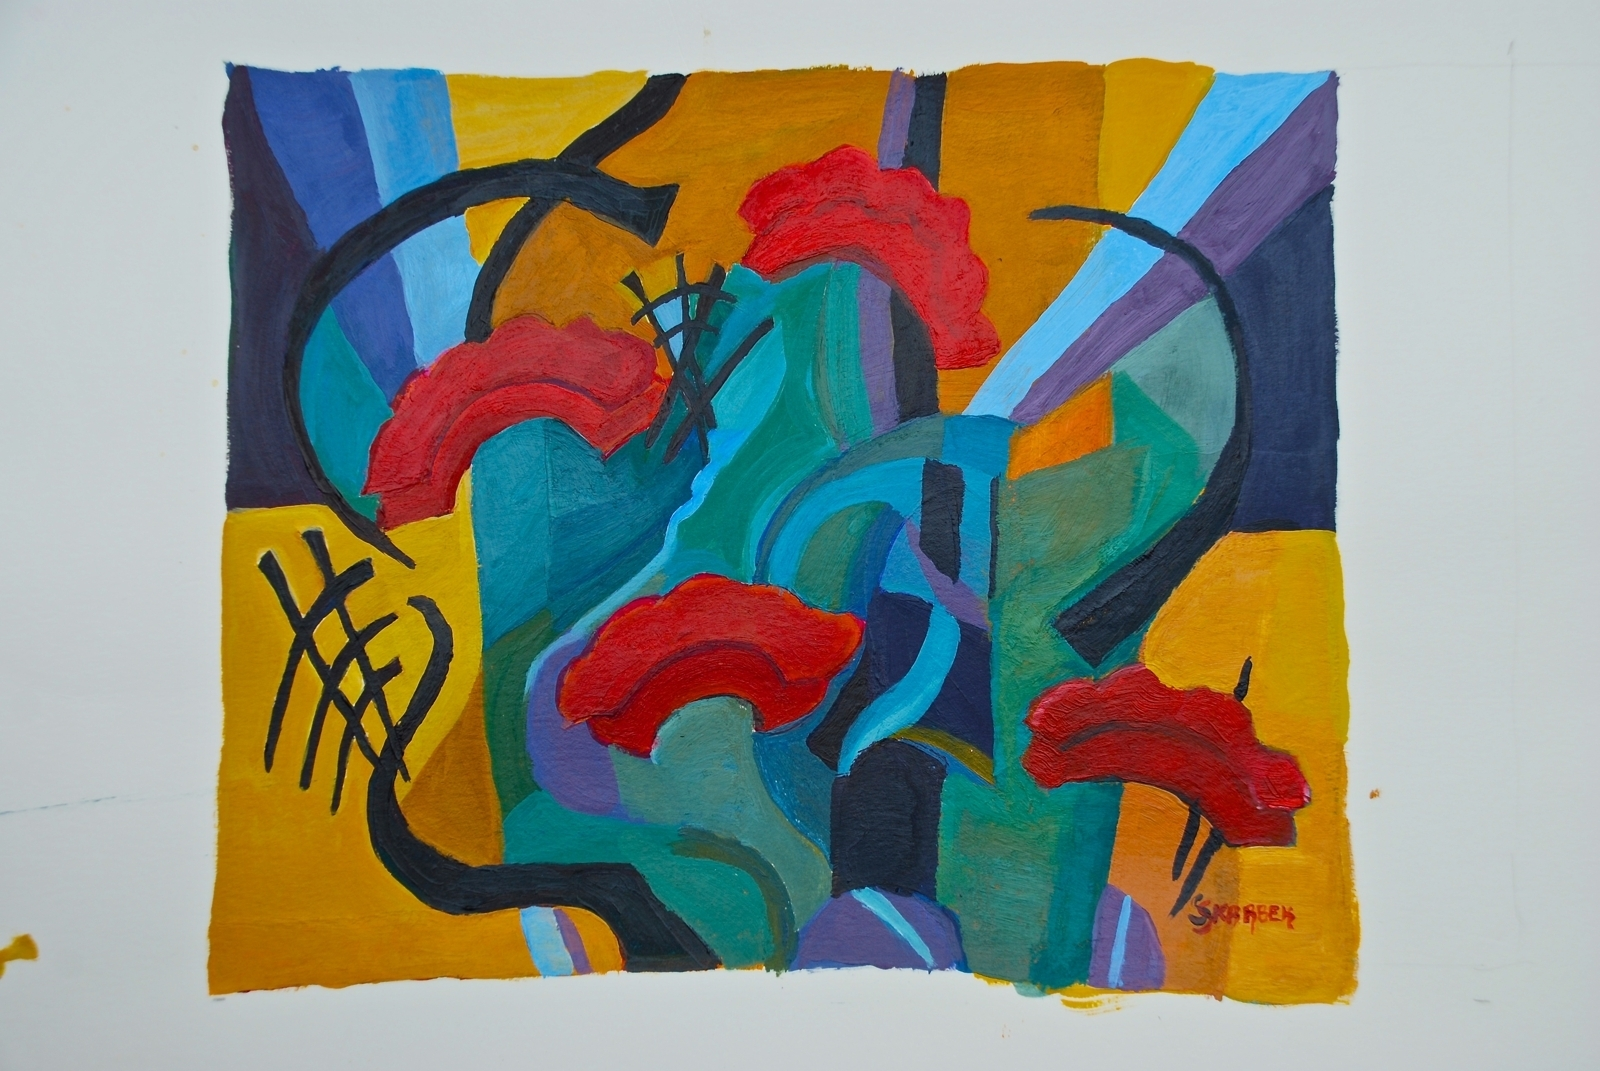 Sophie Skarbek, Geraniums, 2014, acrylic on paper, 28x23cm image